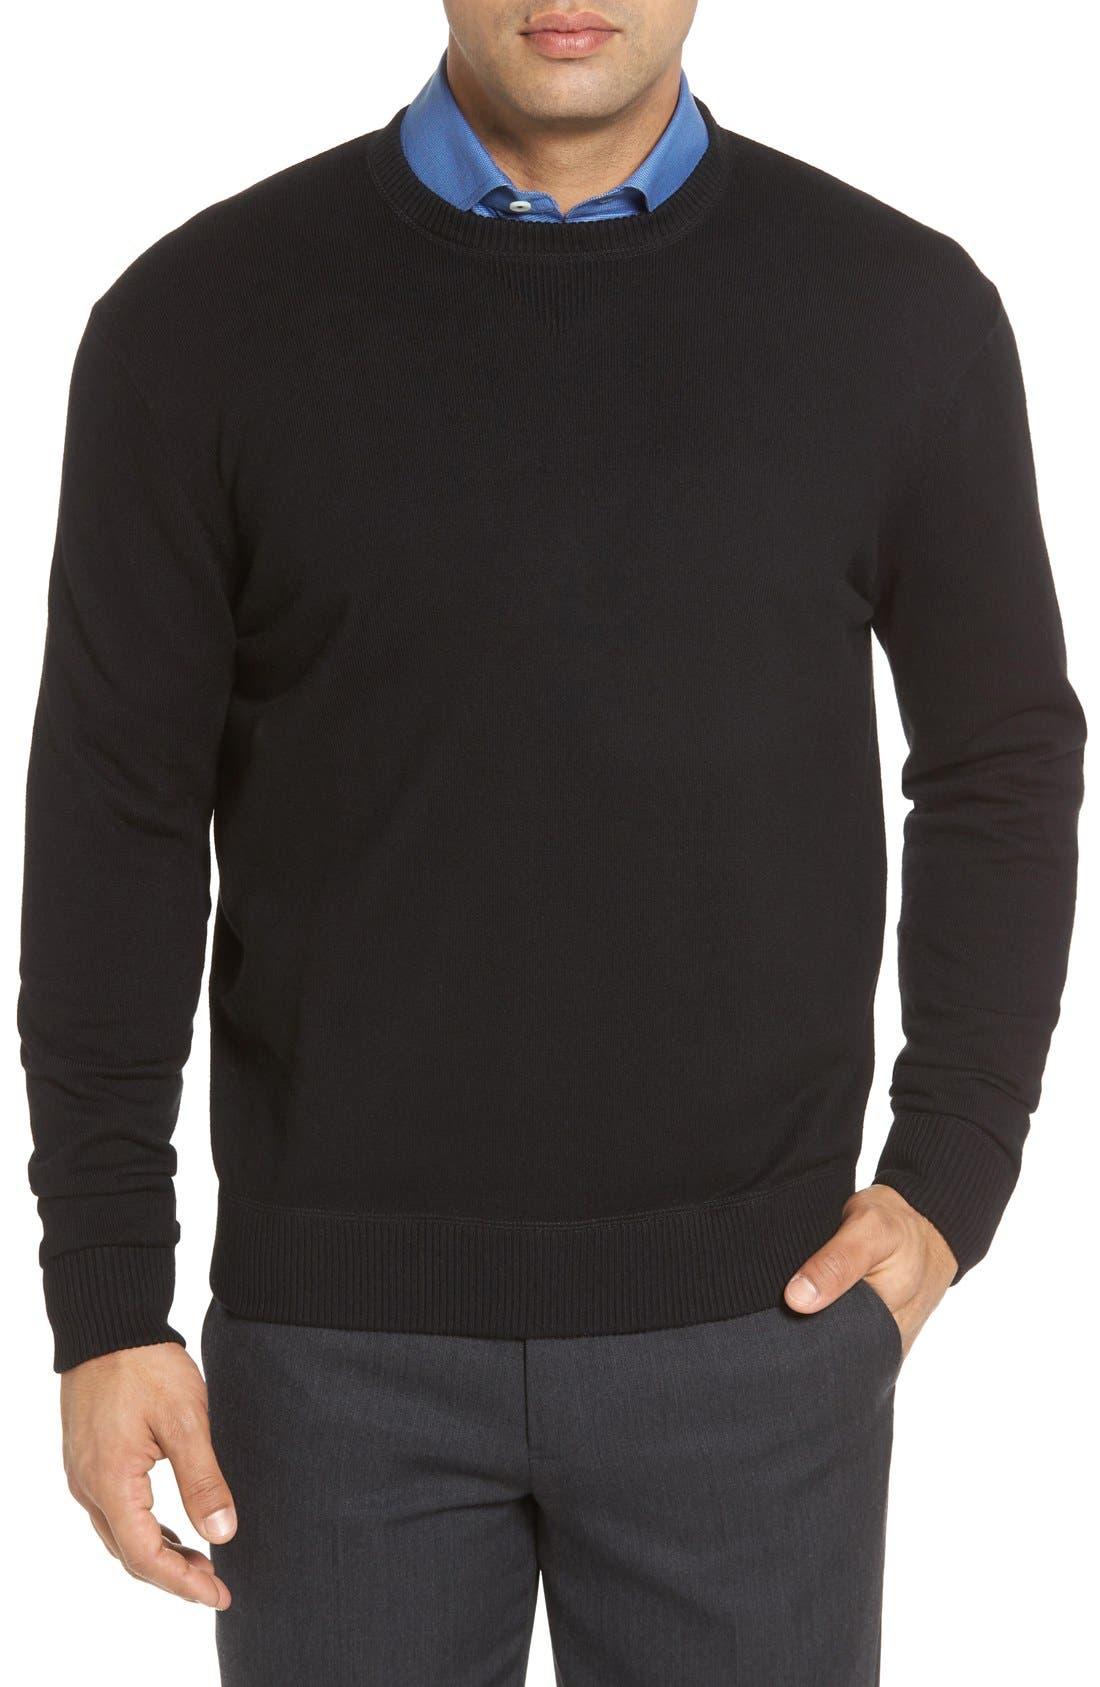 'Jersey Sport' Cotton Blend Crewneck Sweater,                         Main,                         color, 001